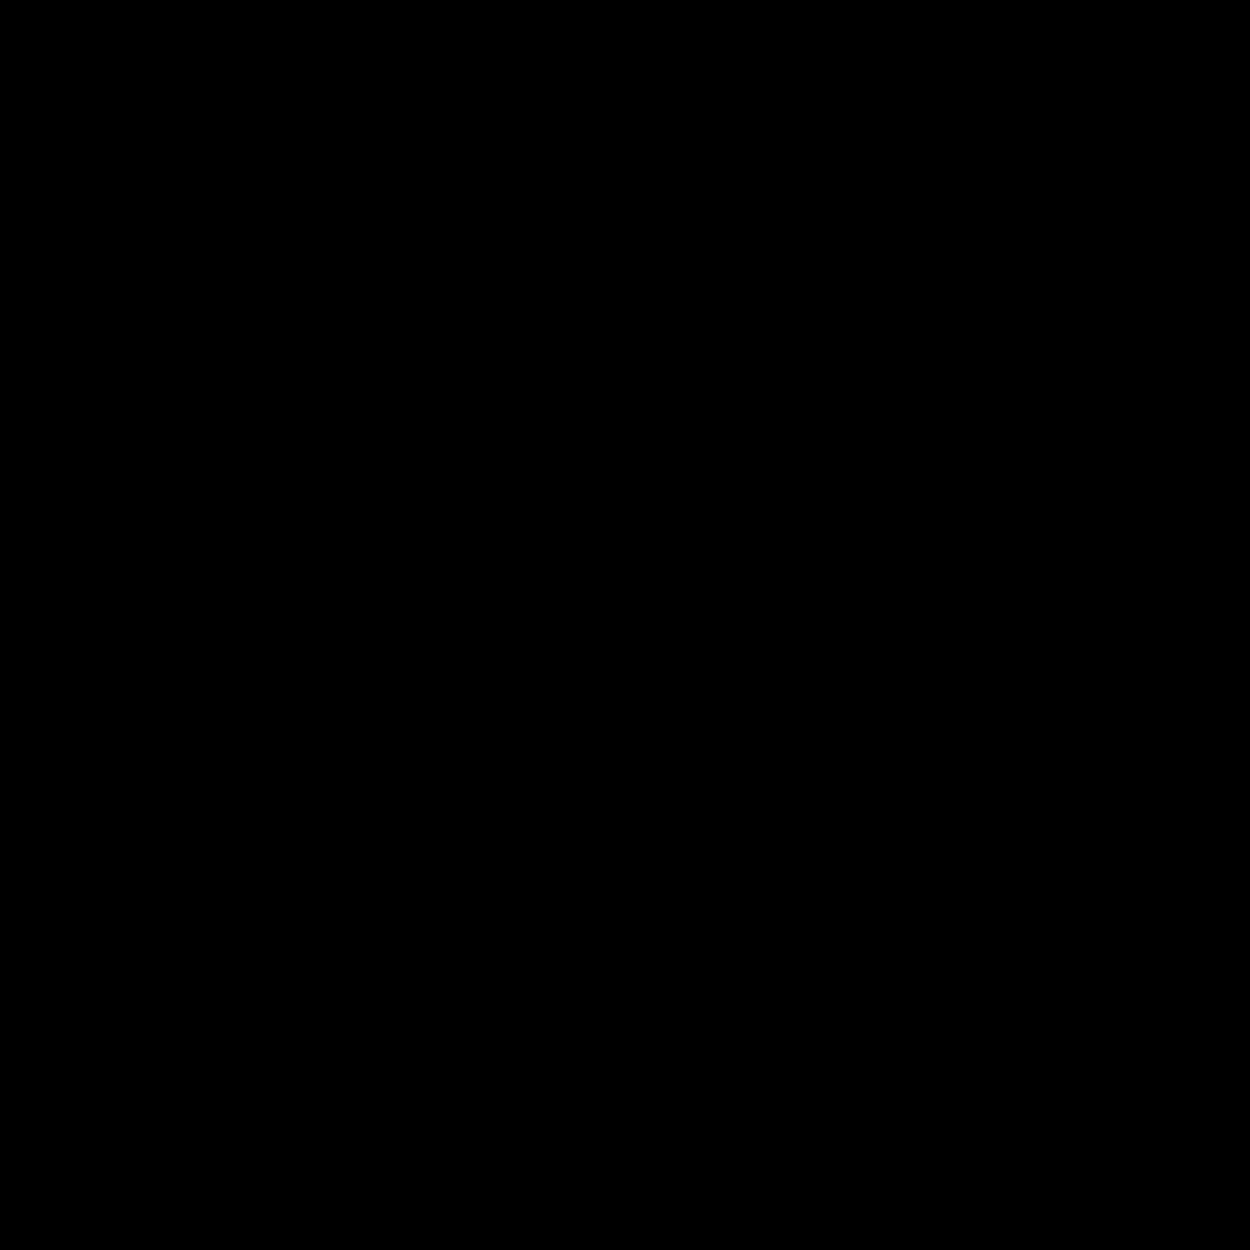 BLACK_LOGO_FAIRMONT_MYKB